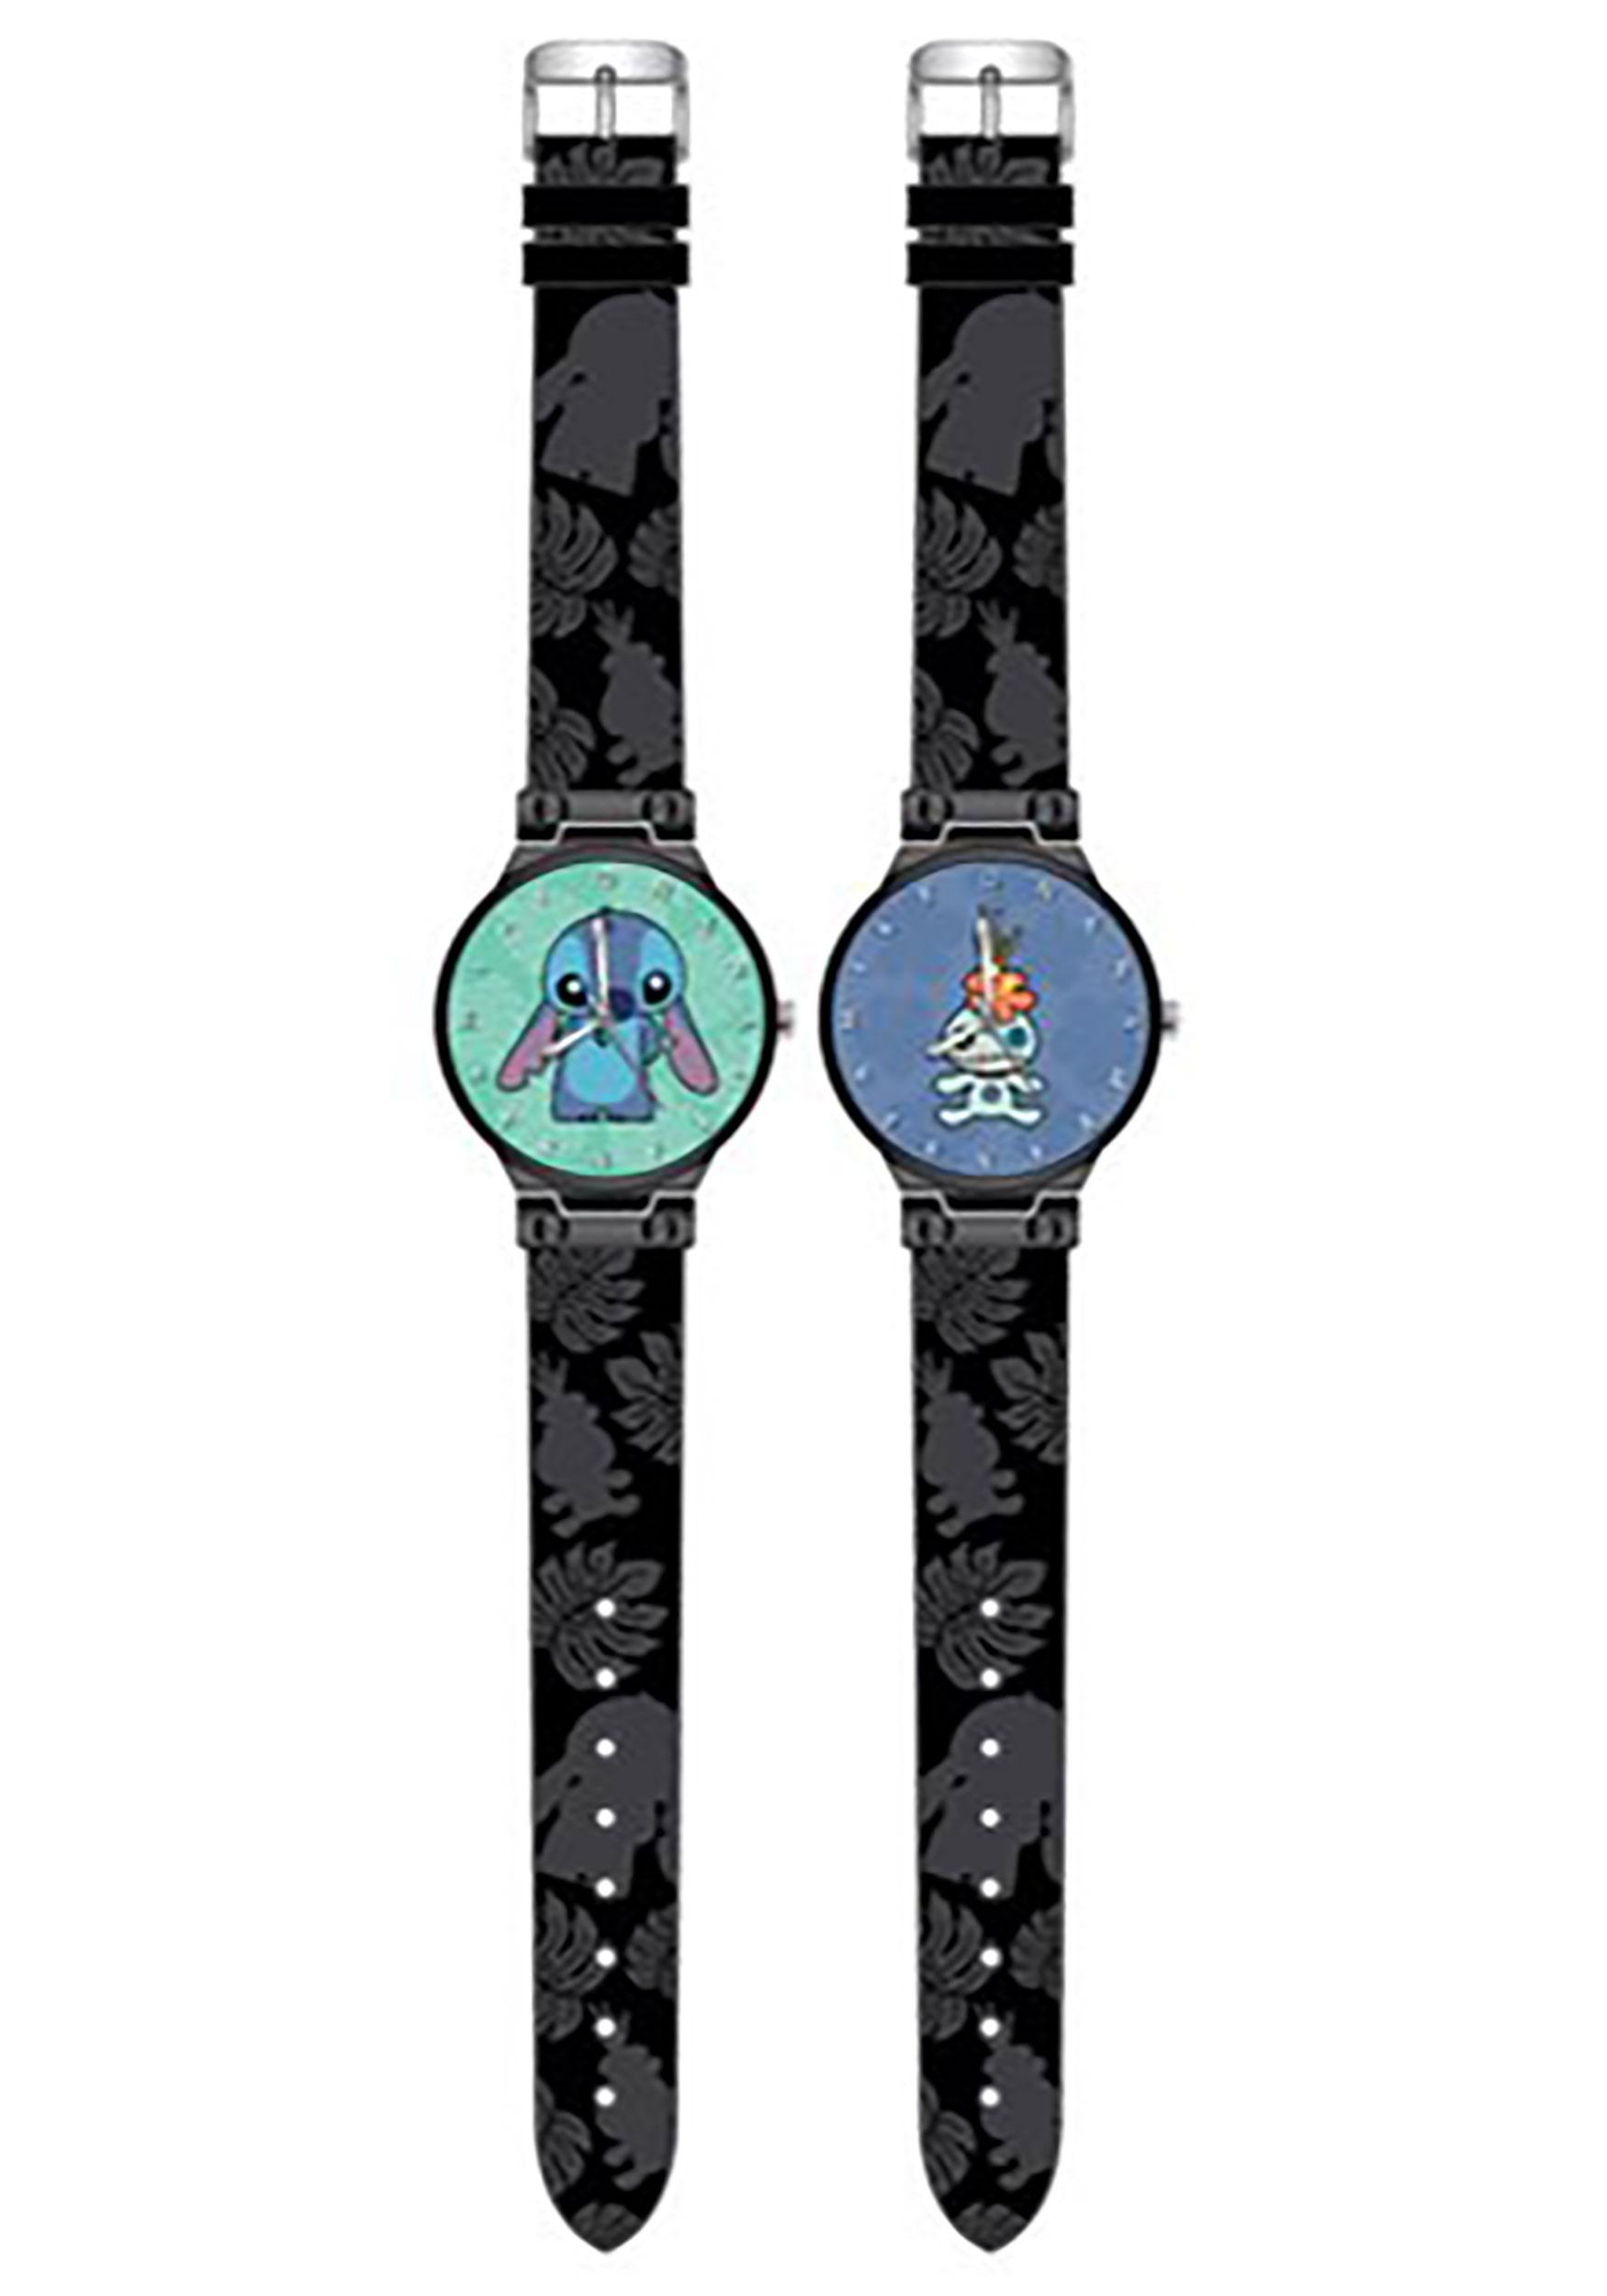 Scrump and Stitch Lilo and Stitch Watch 2-Pack Set